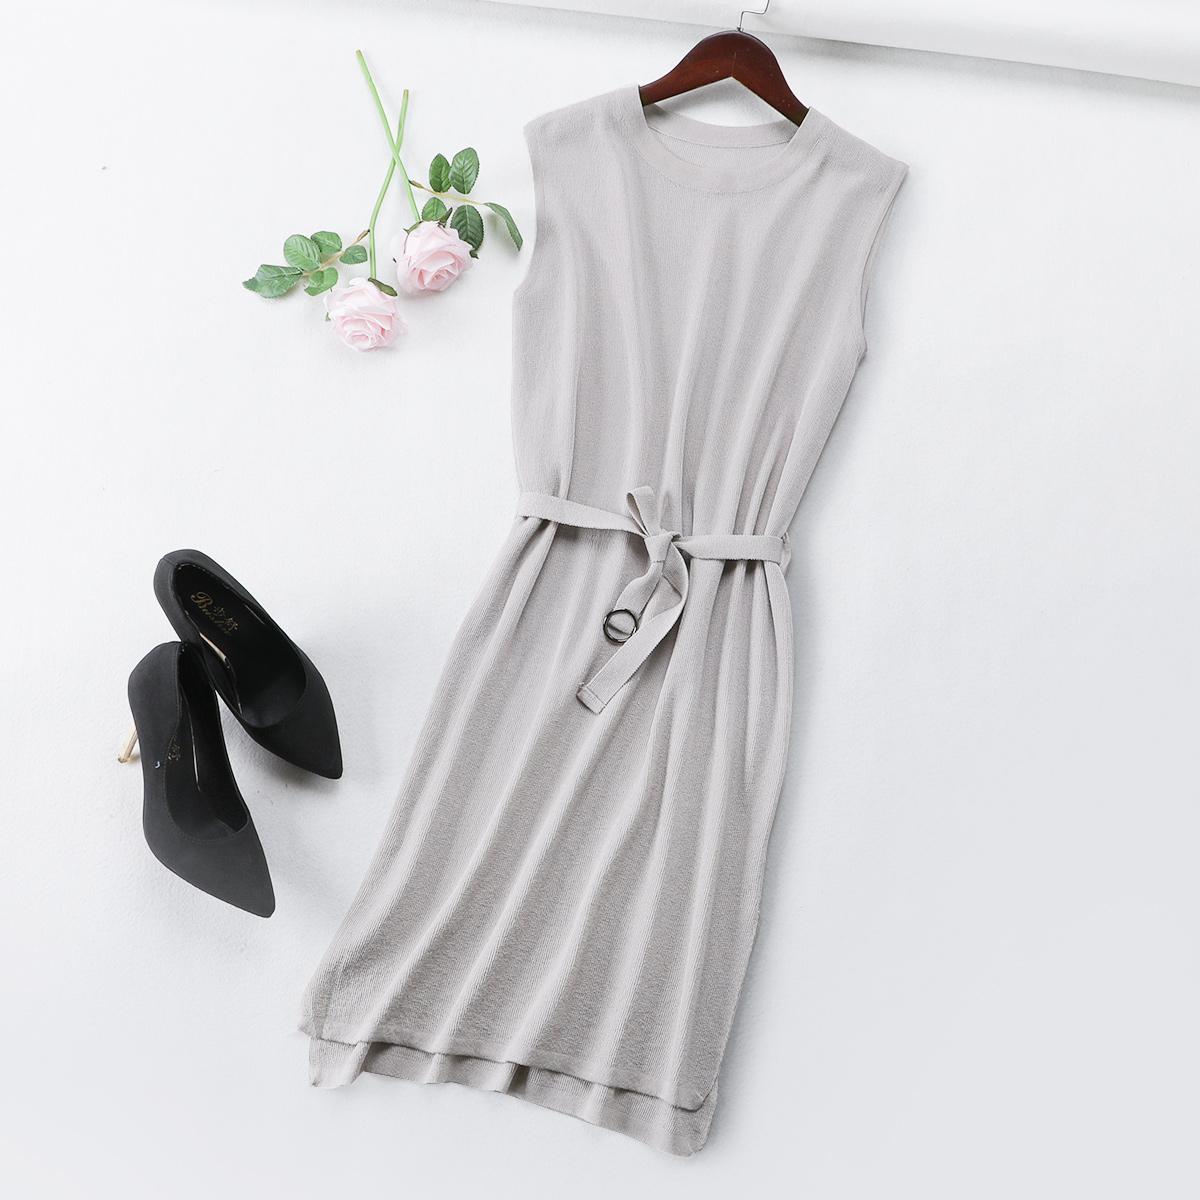 M3 夏季新款连衣裙修身冰丝针织无袖韩版气质纯色束腰中长款开叉